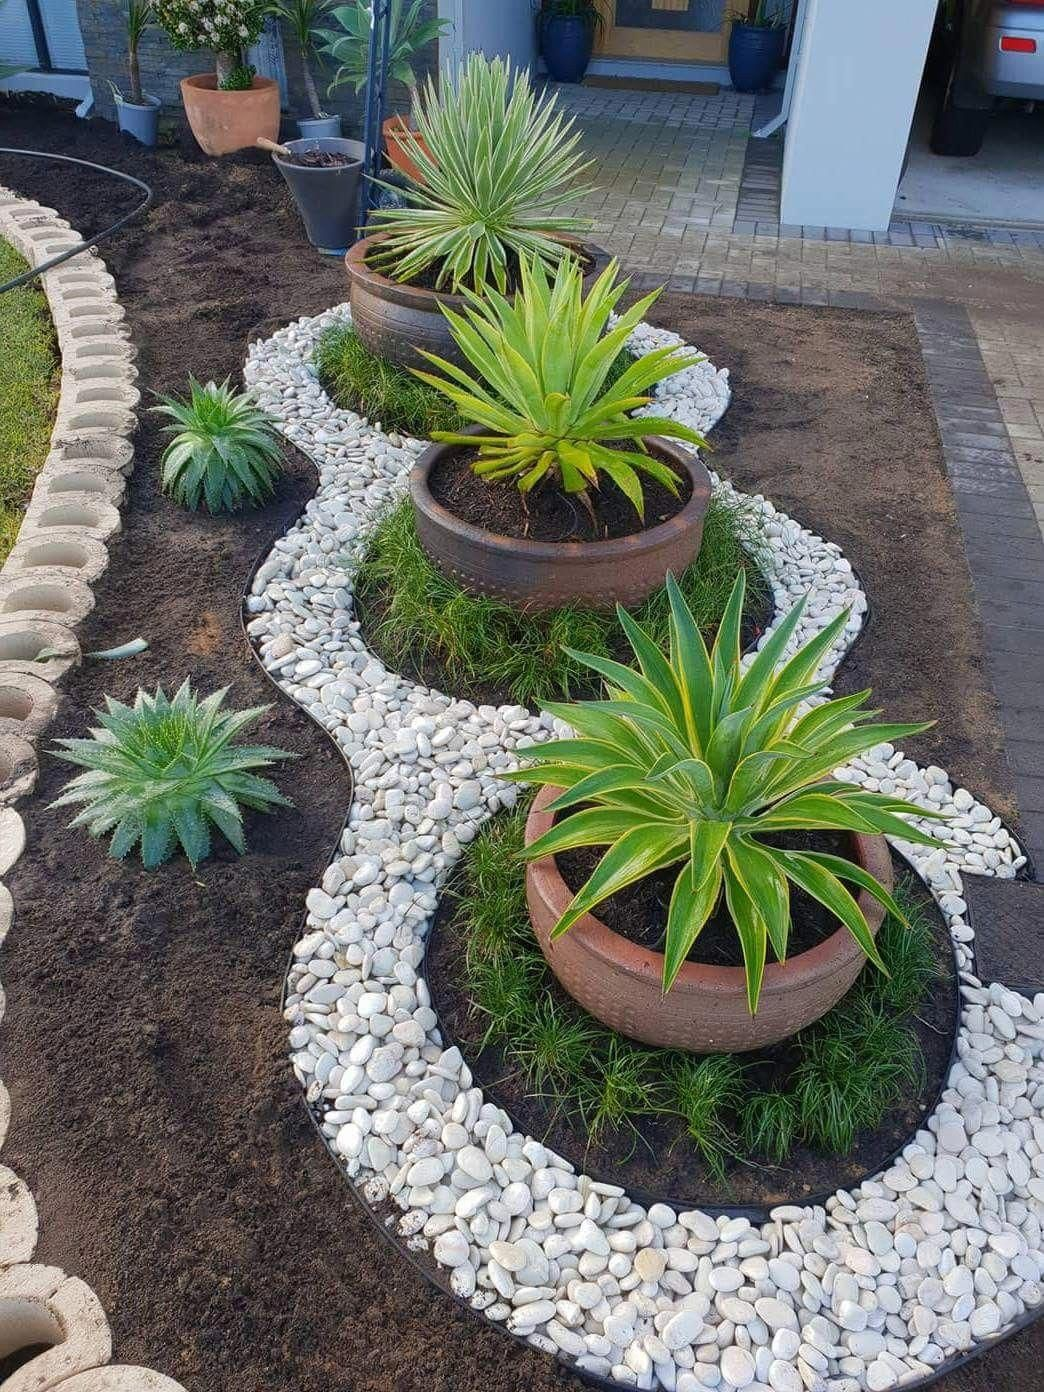 Garden and Gardening Project Ideas  Garden Decor Project Ideas